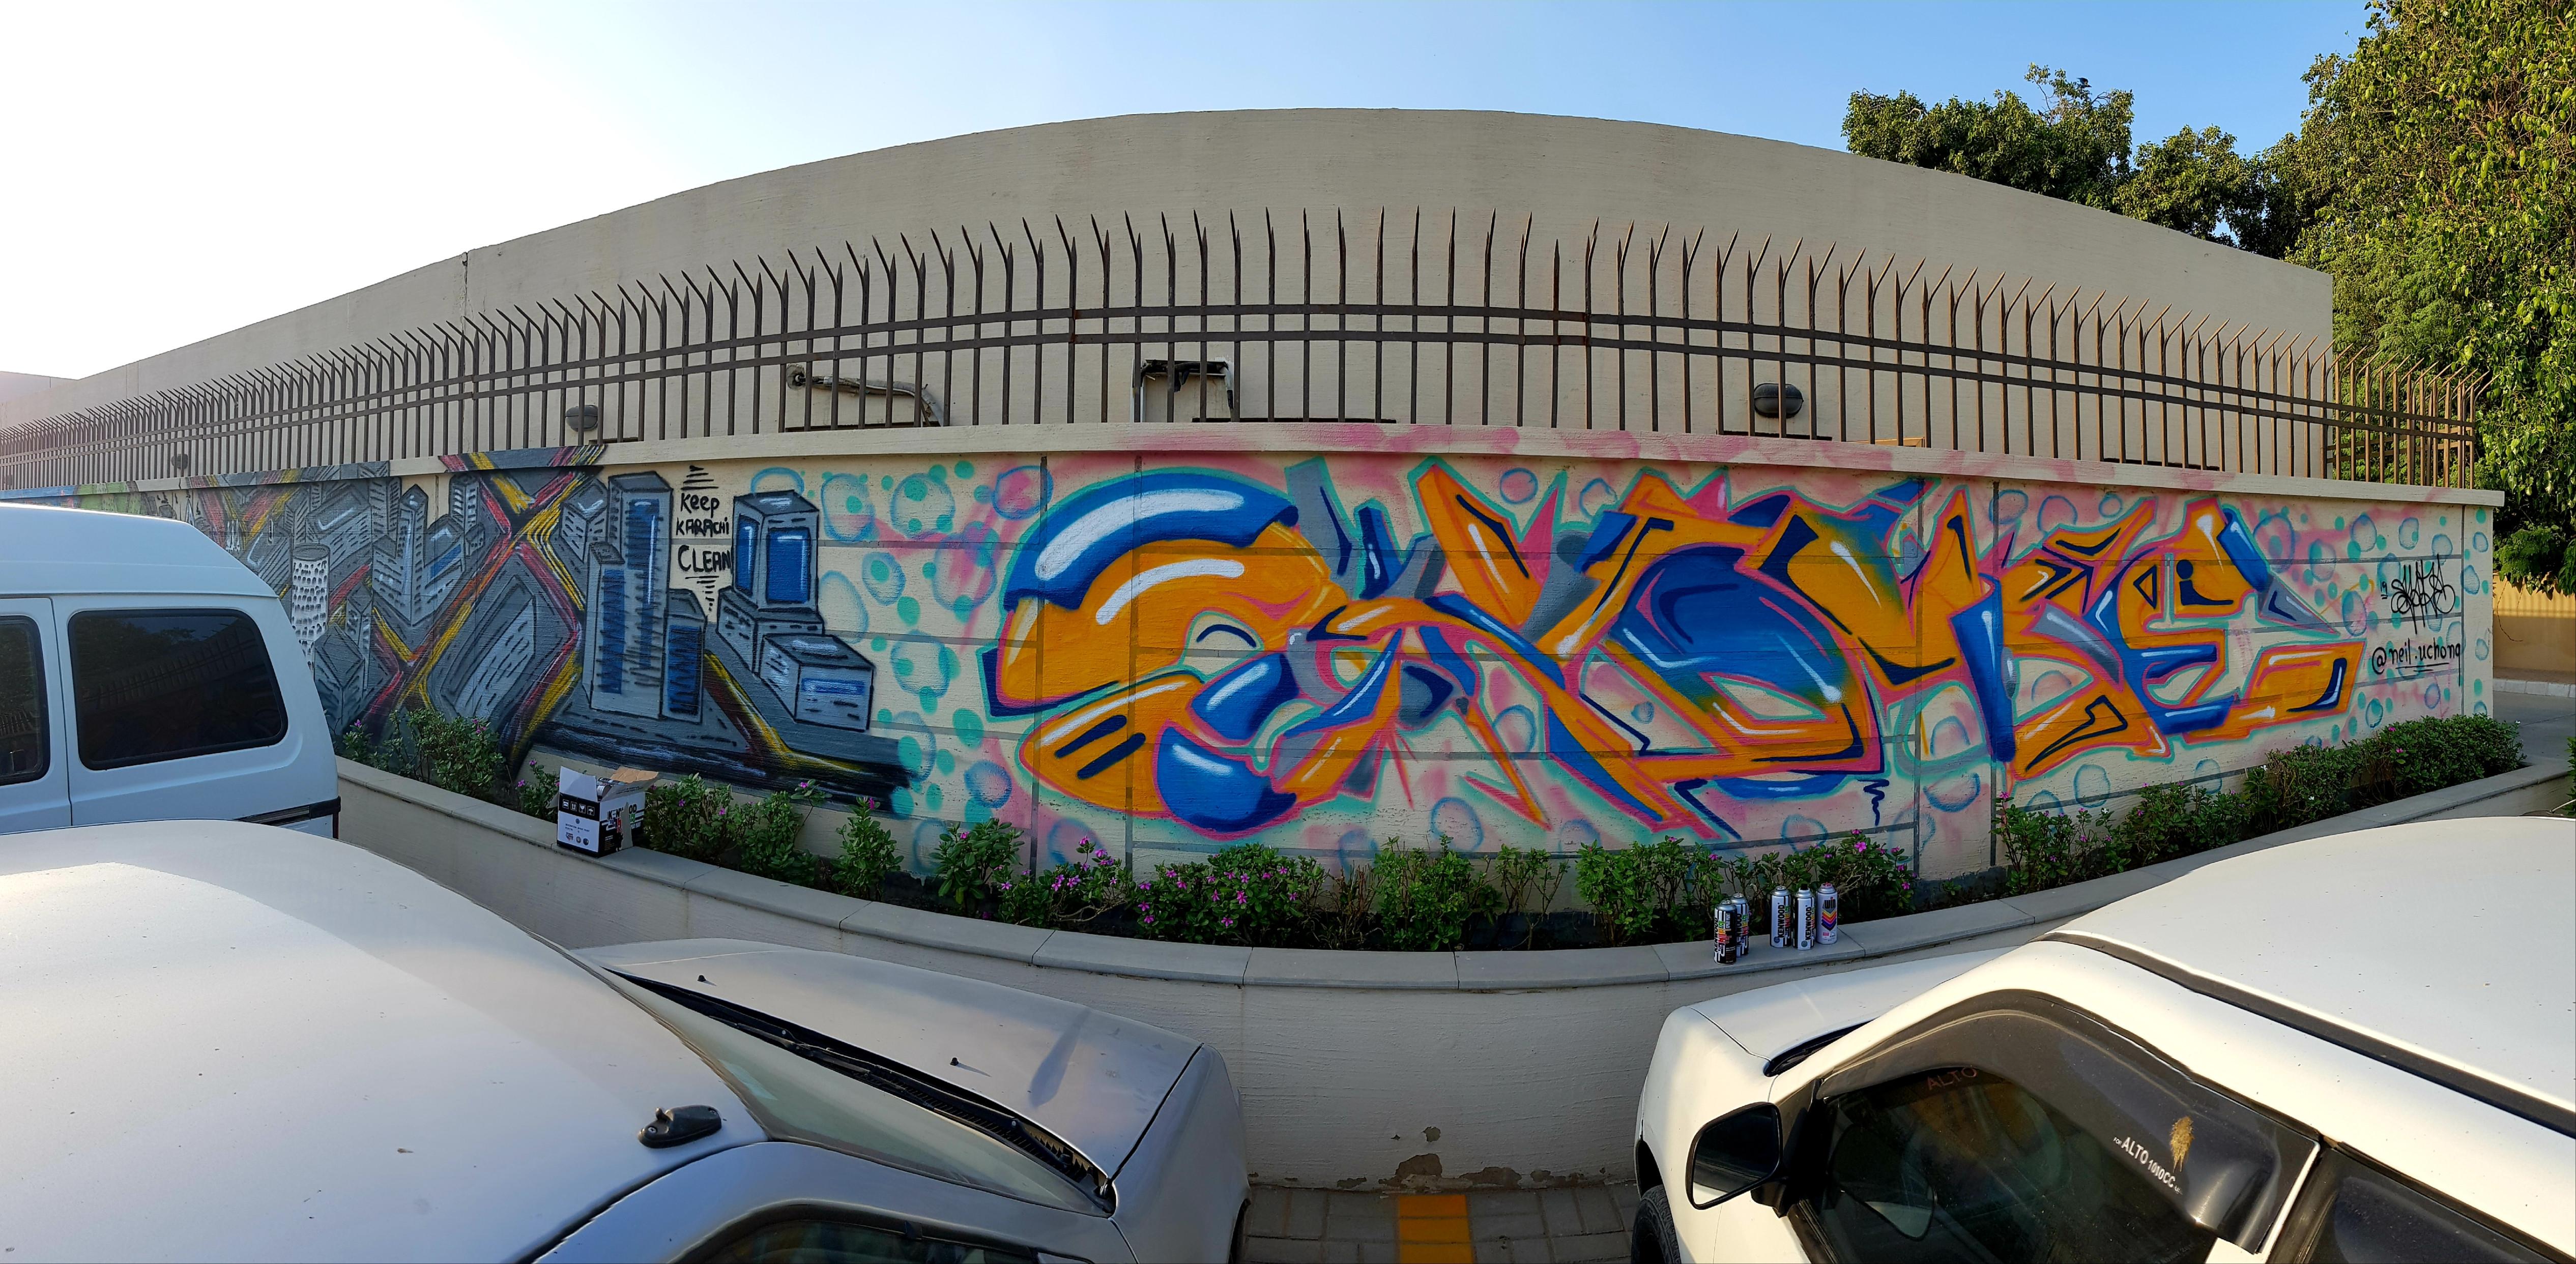 neil unchong s art spatter across the walls of karachi photo neil uchong quratulain ejaz